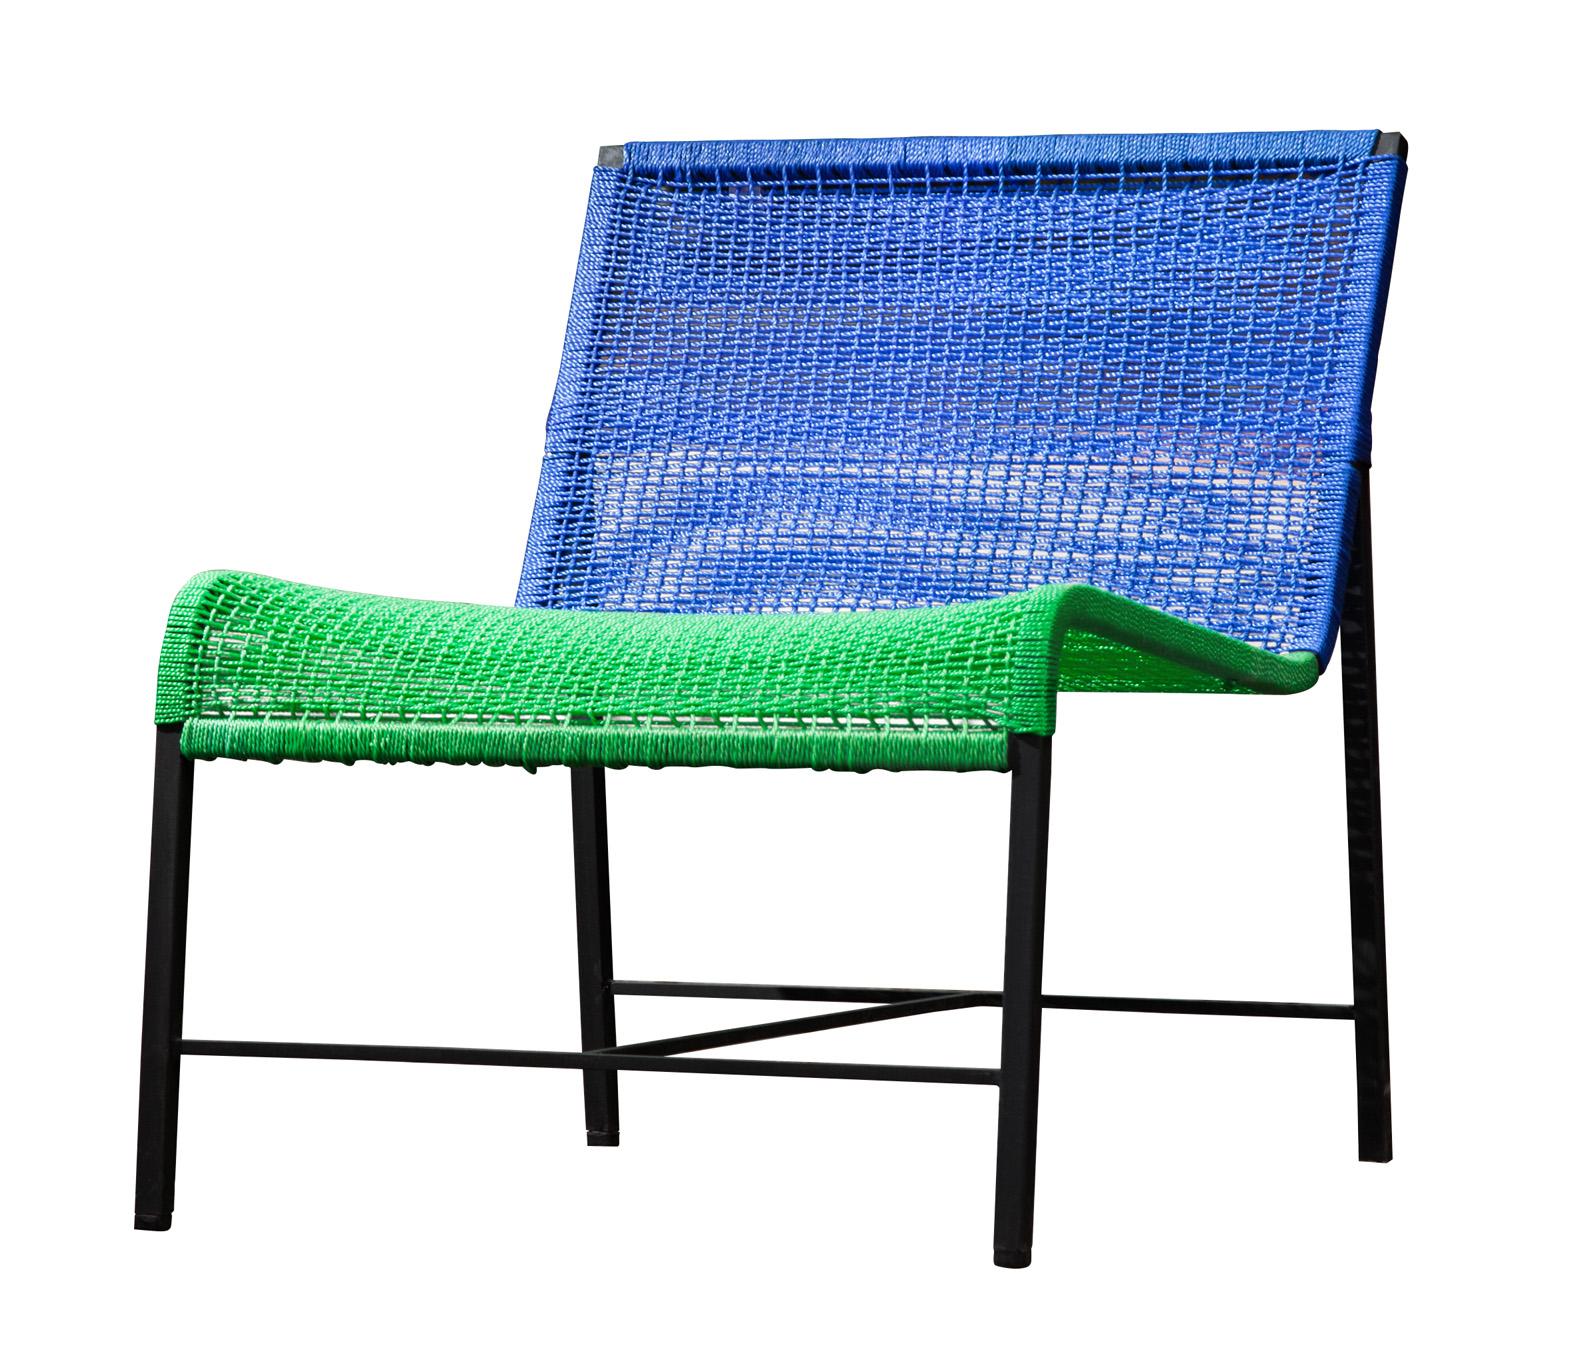 KANTO bleu/vert